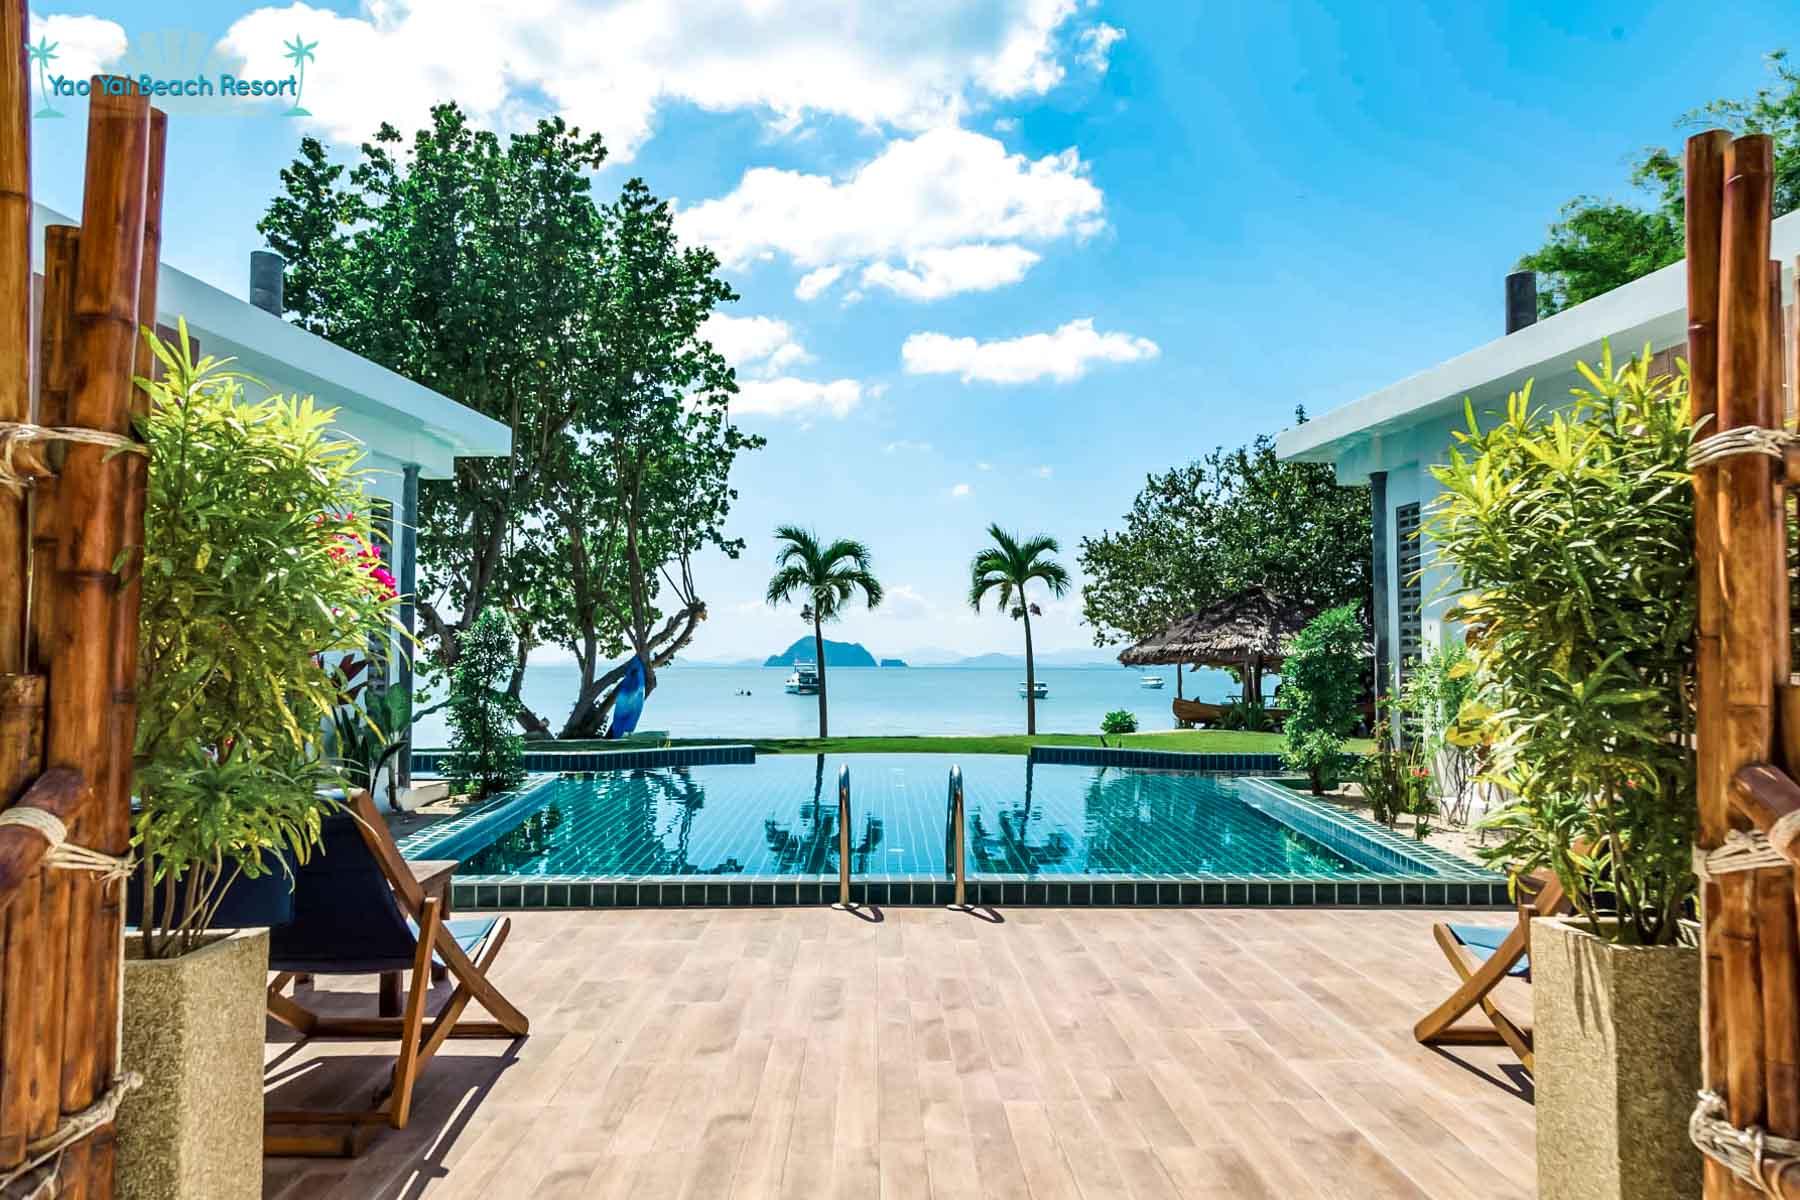 big pool view Yao Yai Beach Resort Thailand